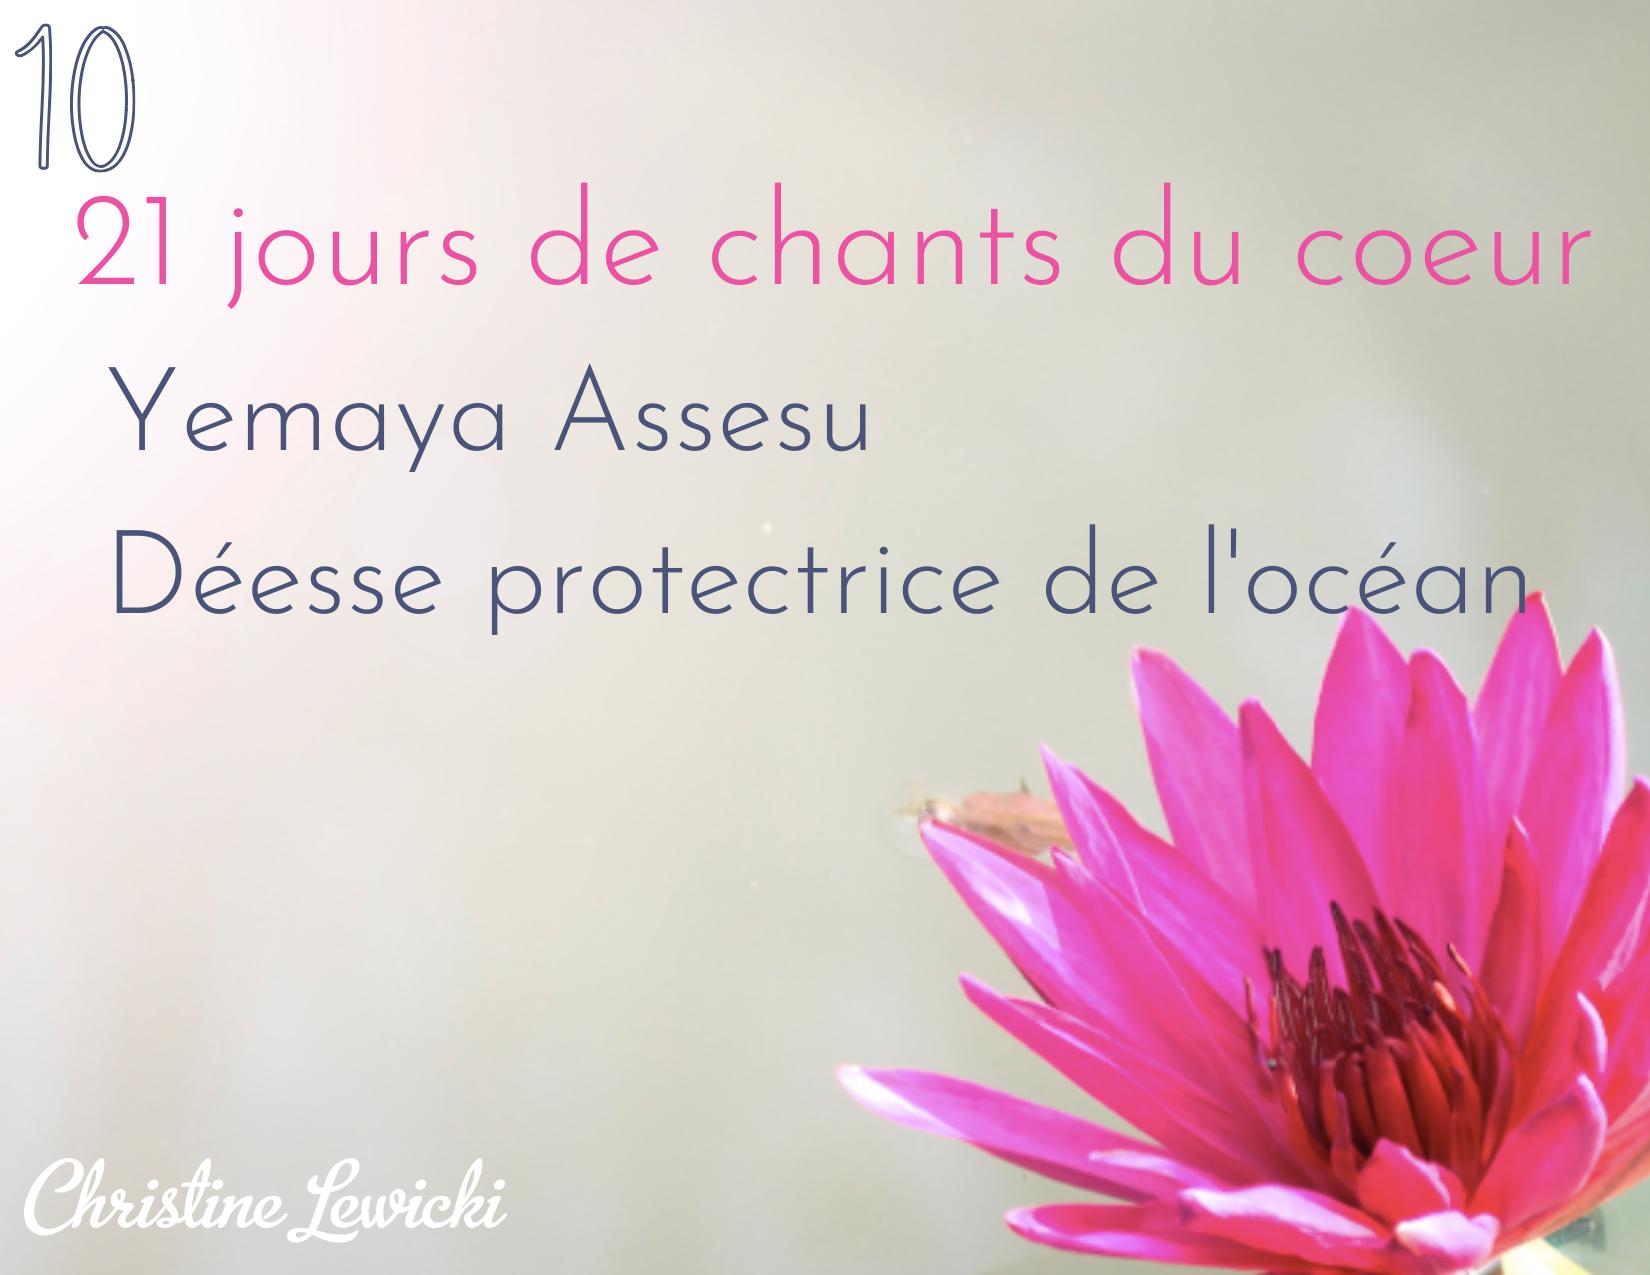 Yemaya Assessu - déesse protectrice de l'océan